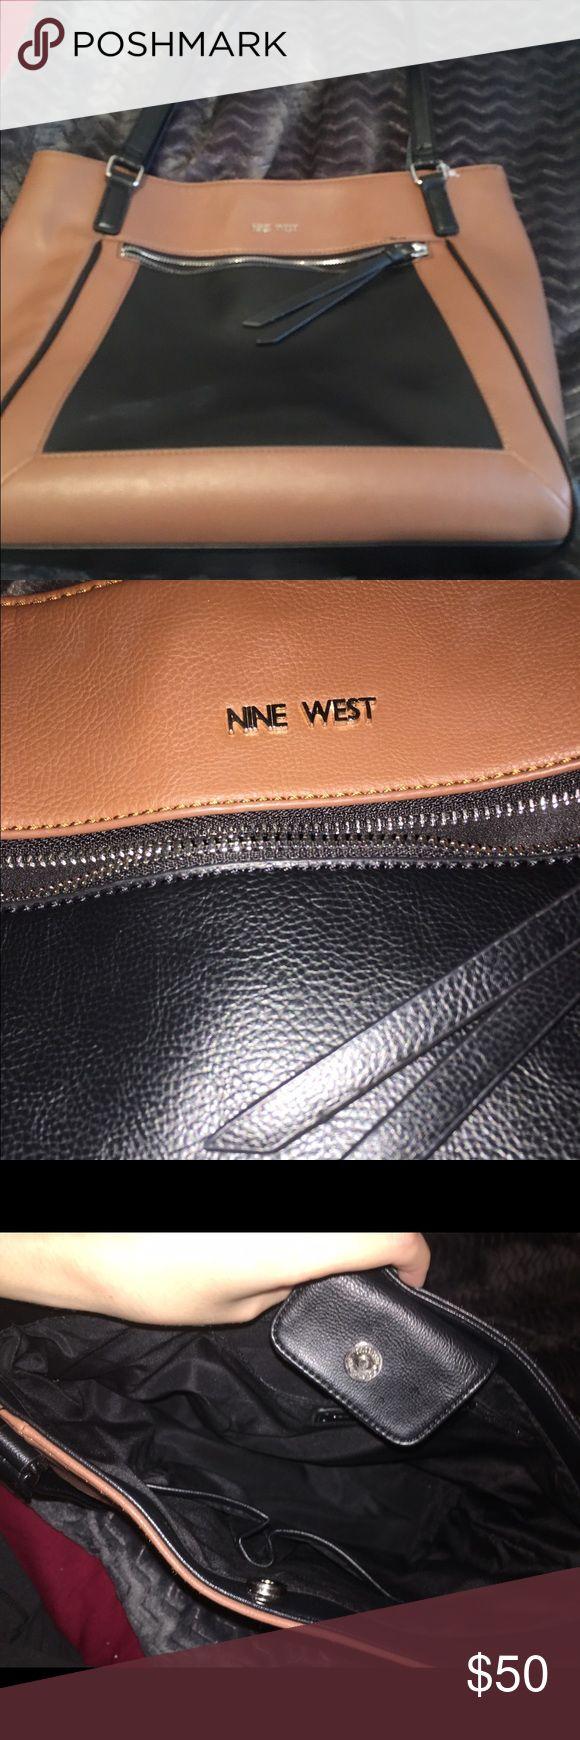 Nine West purse Black and brown Nine West purse. Perfect condition! Nine West Bags Shoulder Bags